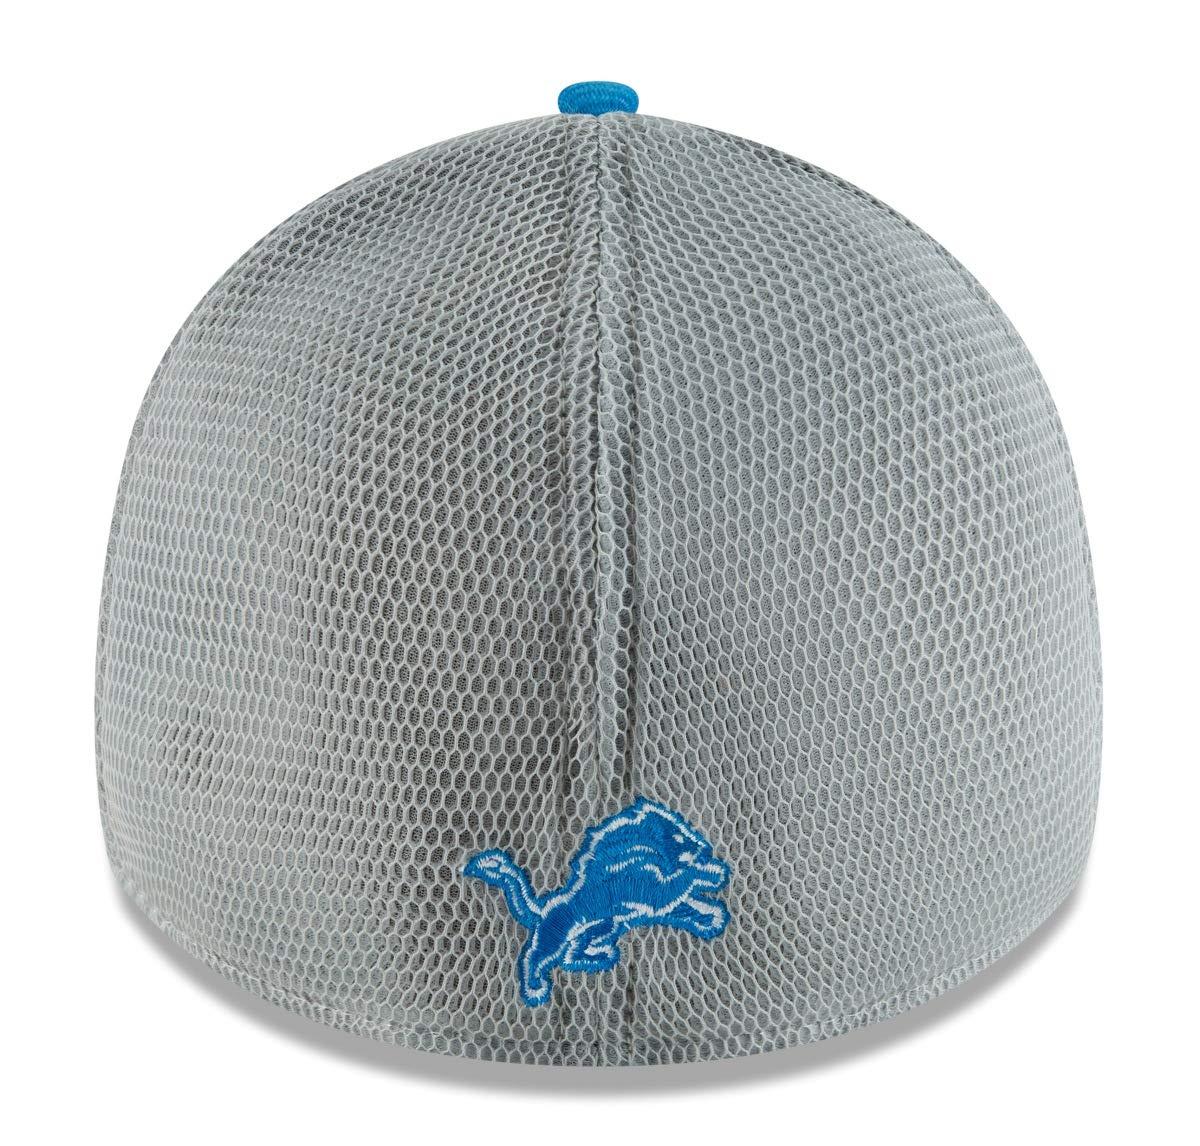 newest 651e3 018a5 Amazon.com   New Era Detroit Lions NFL 39THIRTY 2T Sided Flex Fit Meshback  Hat   Sports   Outdoors